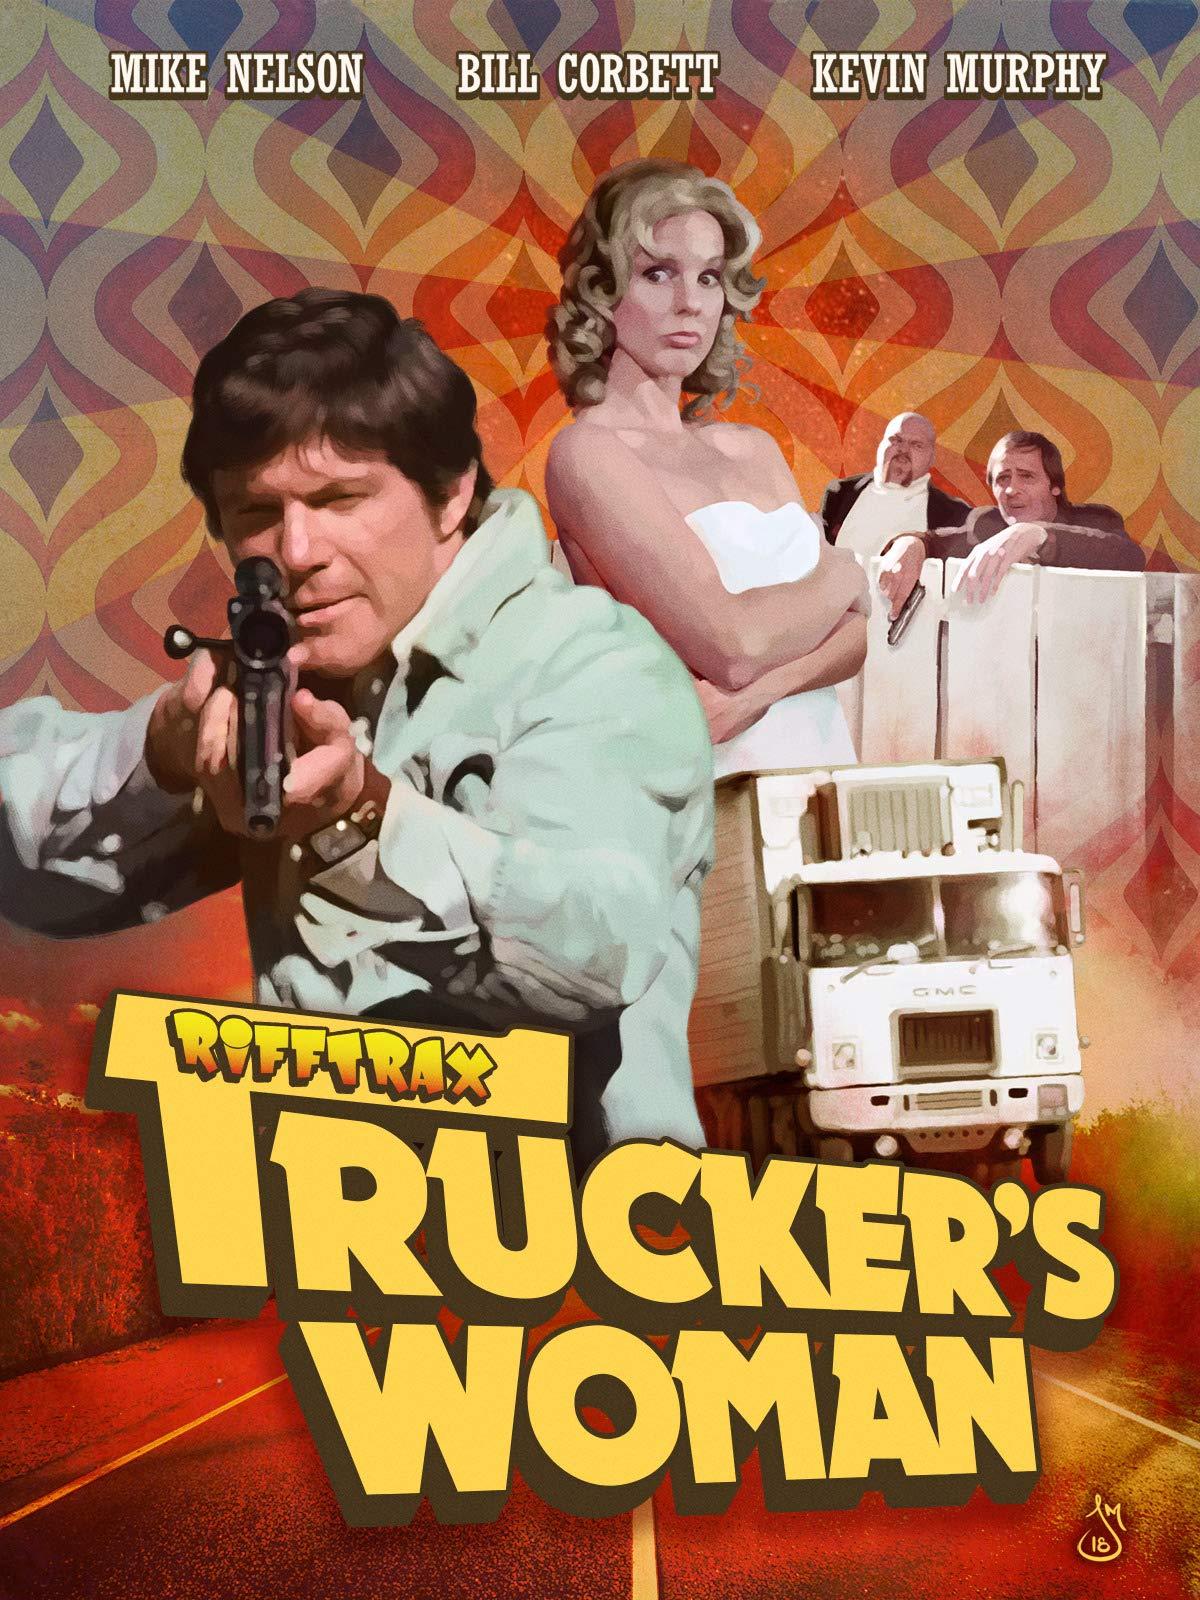 RiffTrax: Trucker's Woman on Amazon Prime Video UK